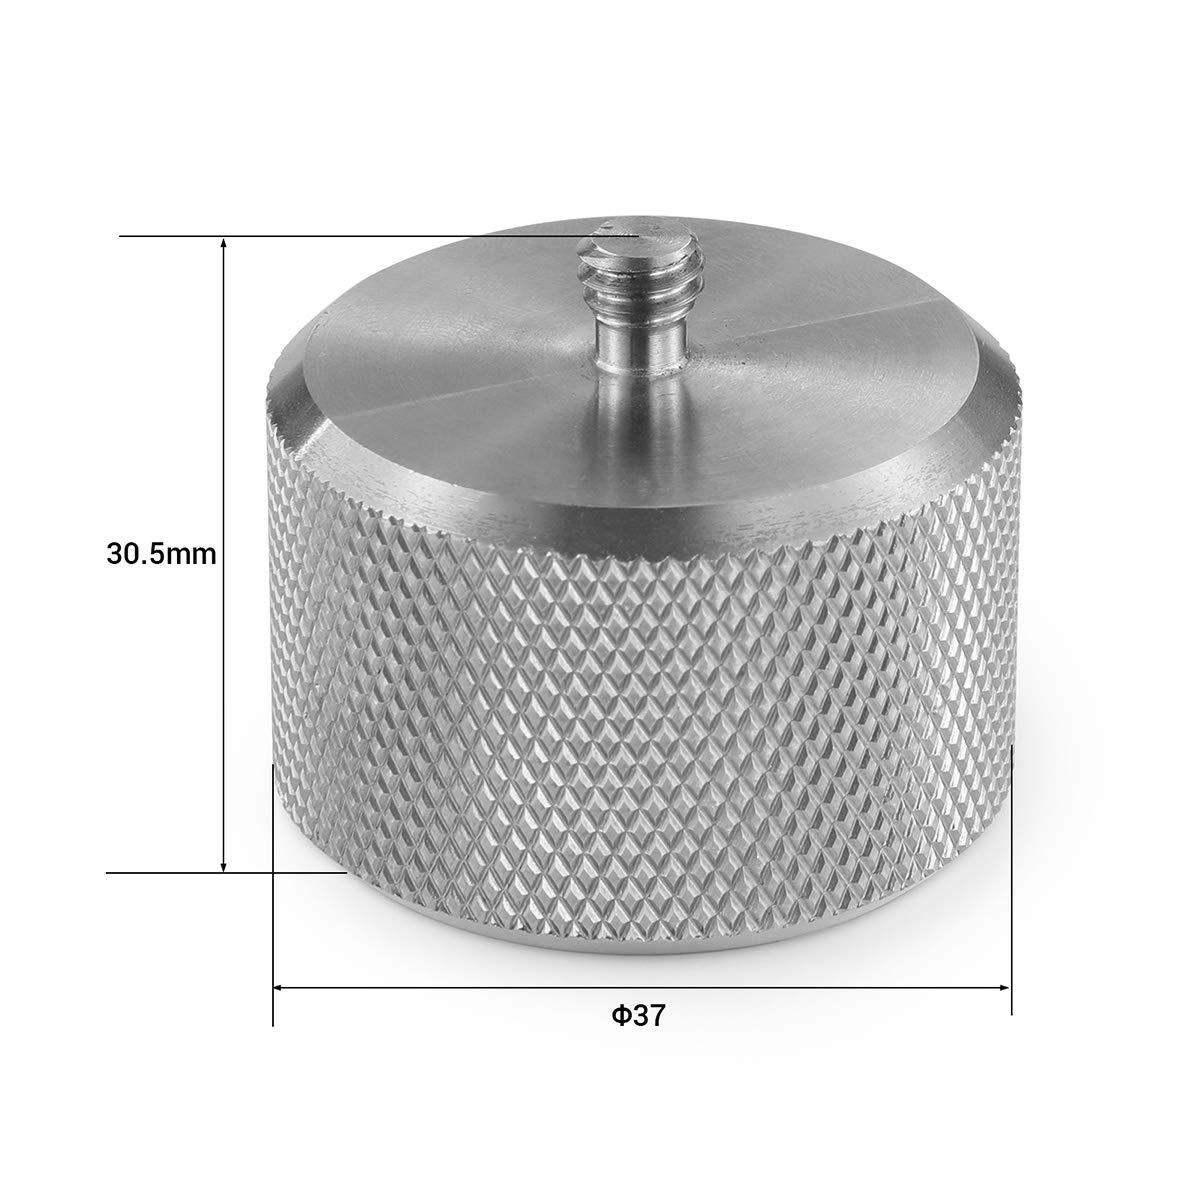 200 g de Contrapeso con Tornillo de 1//4-2285 SMALLRIG Contrapeso Removible Compatible con dji Ronin S y Zhiyun Gimbal